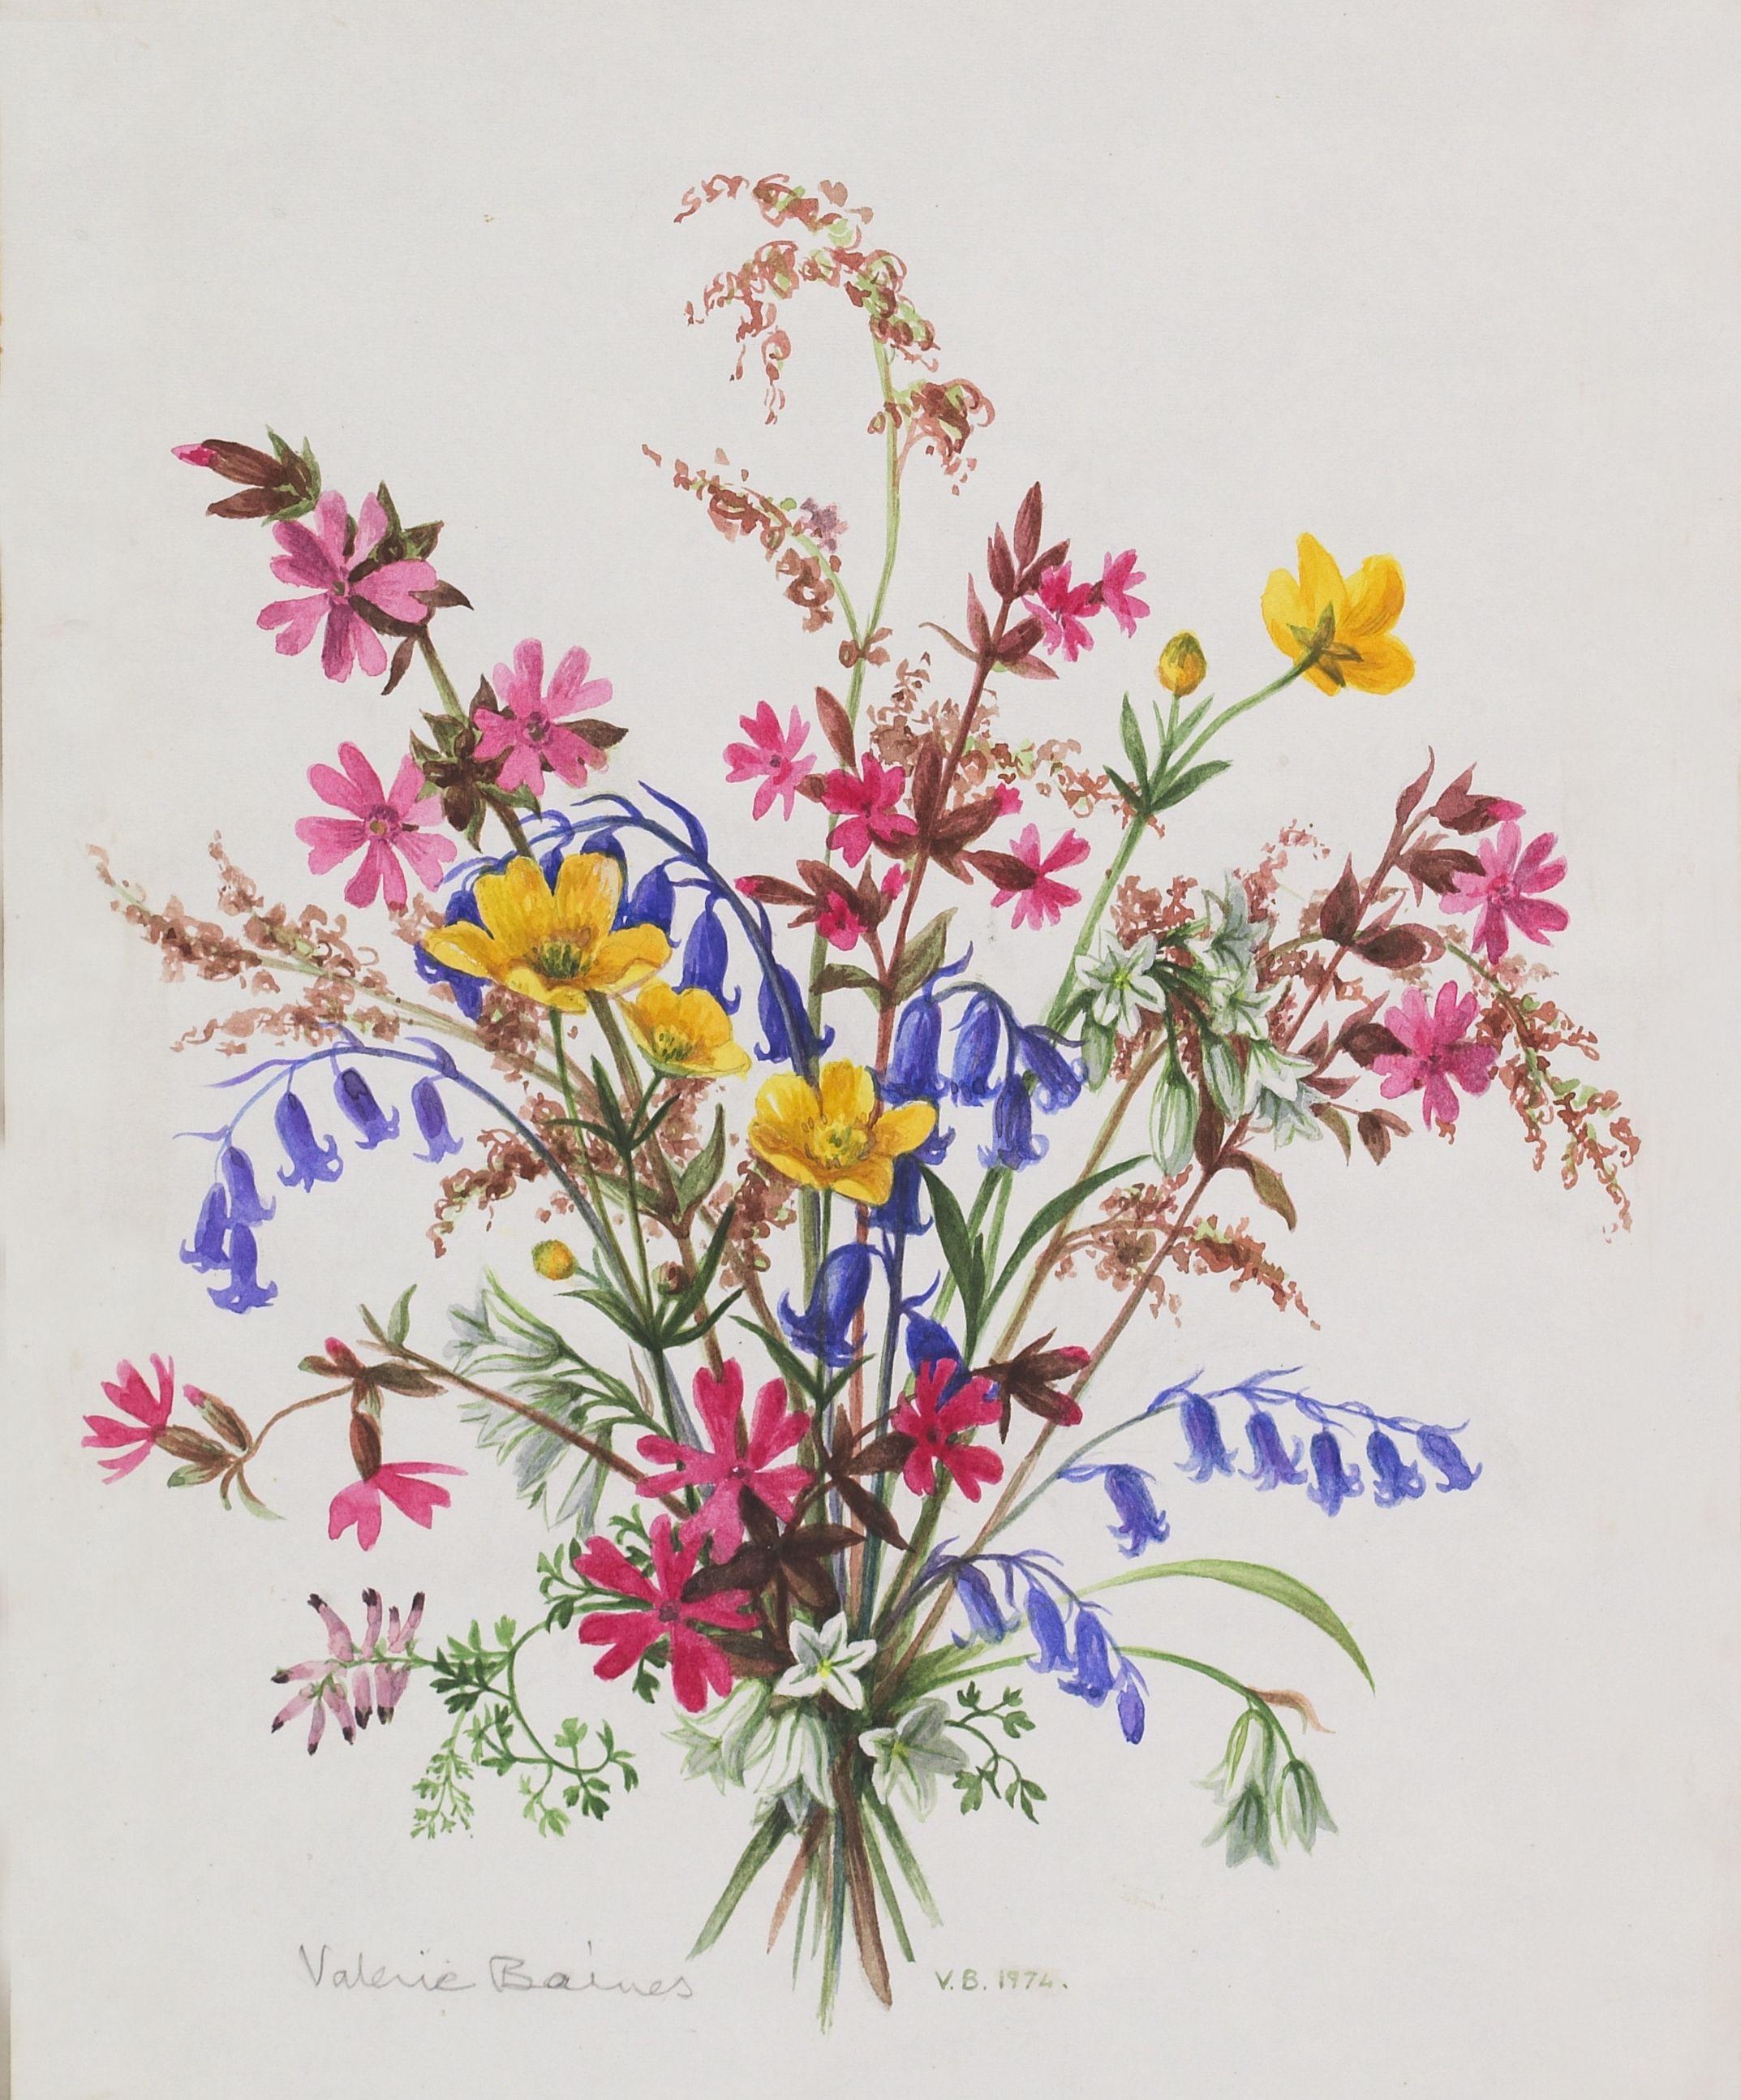 the old botanical garden german alter botanischer garten is a